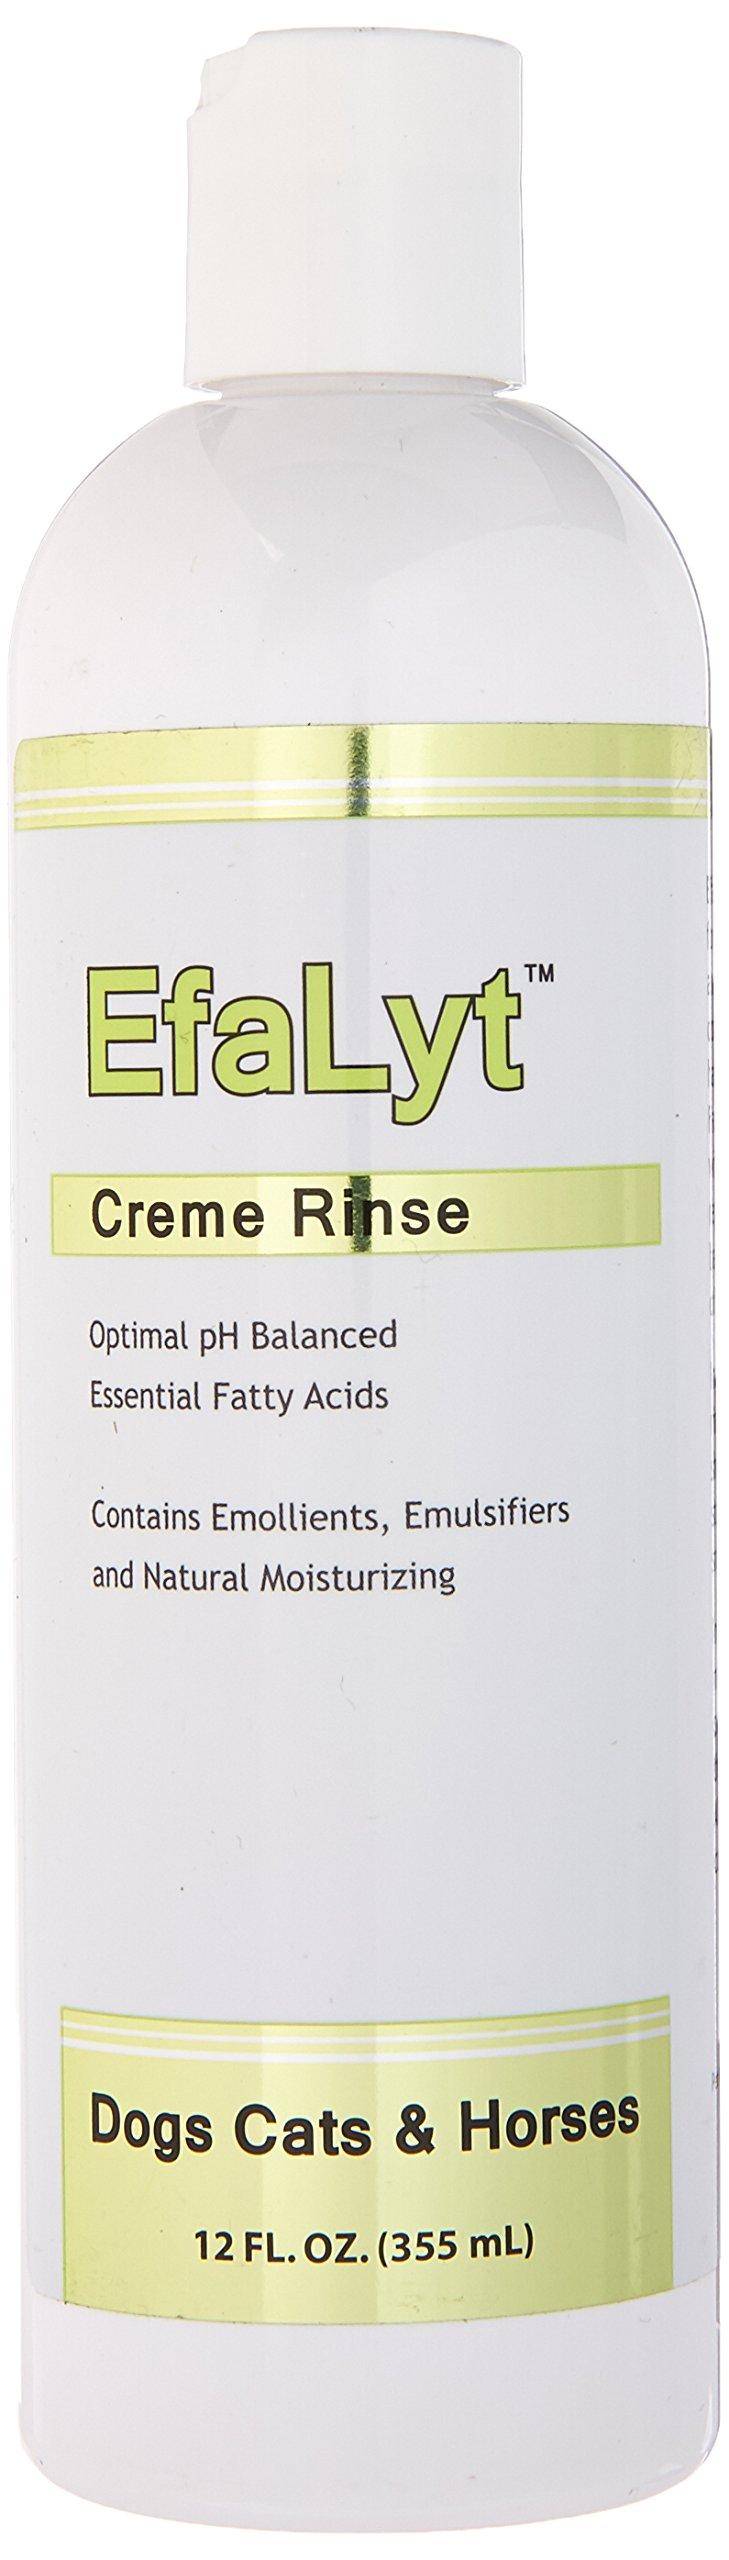 EfaLyt Creme Rinse Remedy Pets - Hypoallergenic Formulation - Natural Moisturizing Promote Hydration - Essential Fatty Acids - 12 fl oz